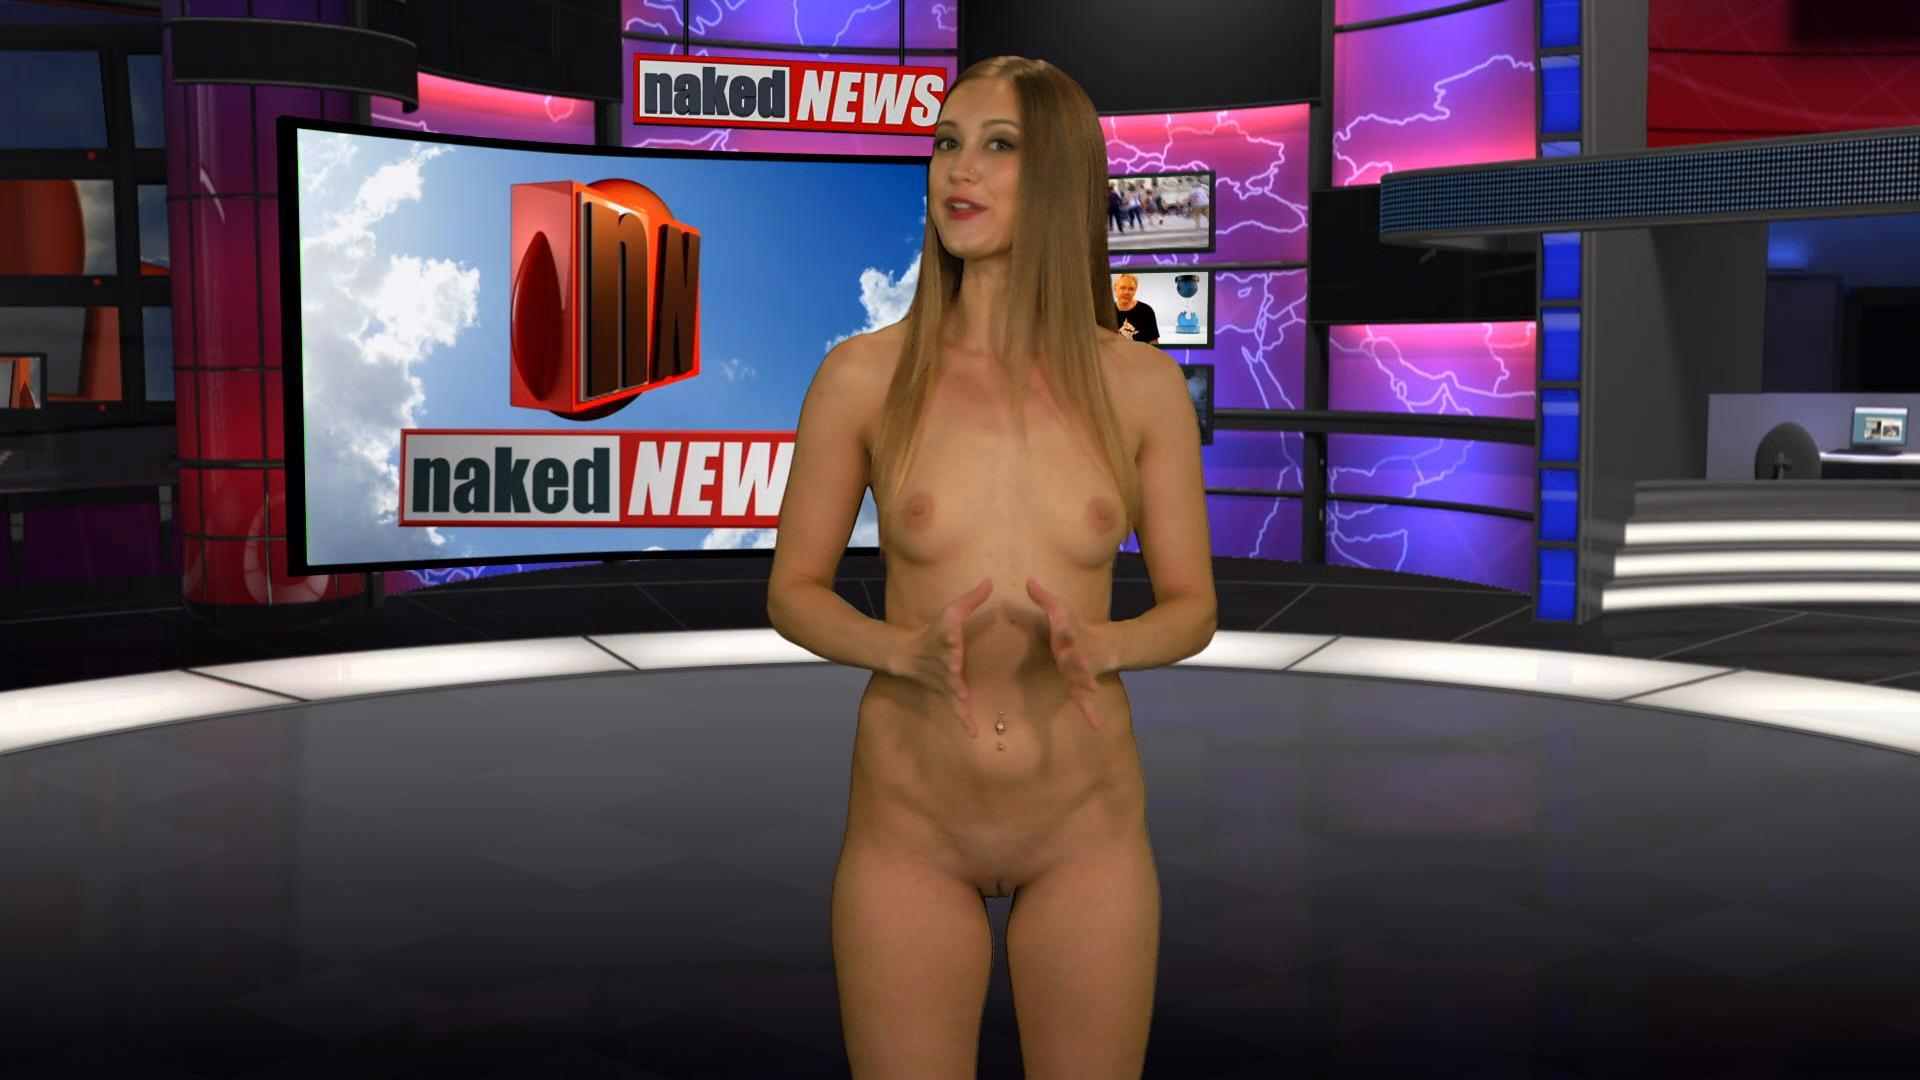 Nude free tv